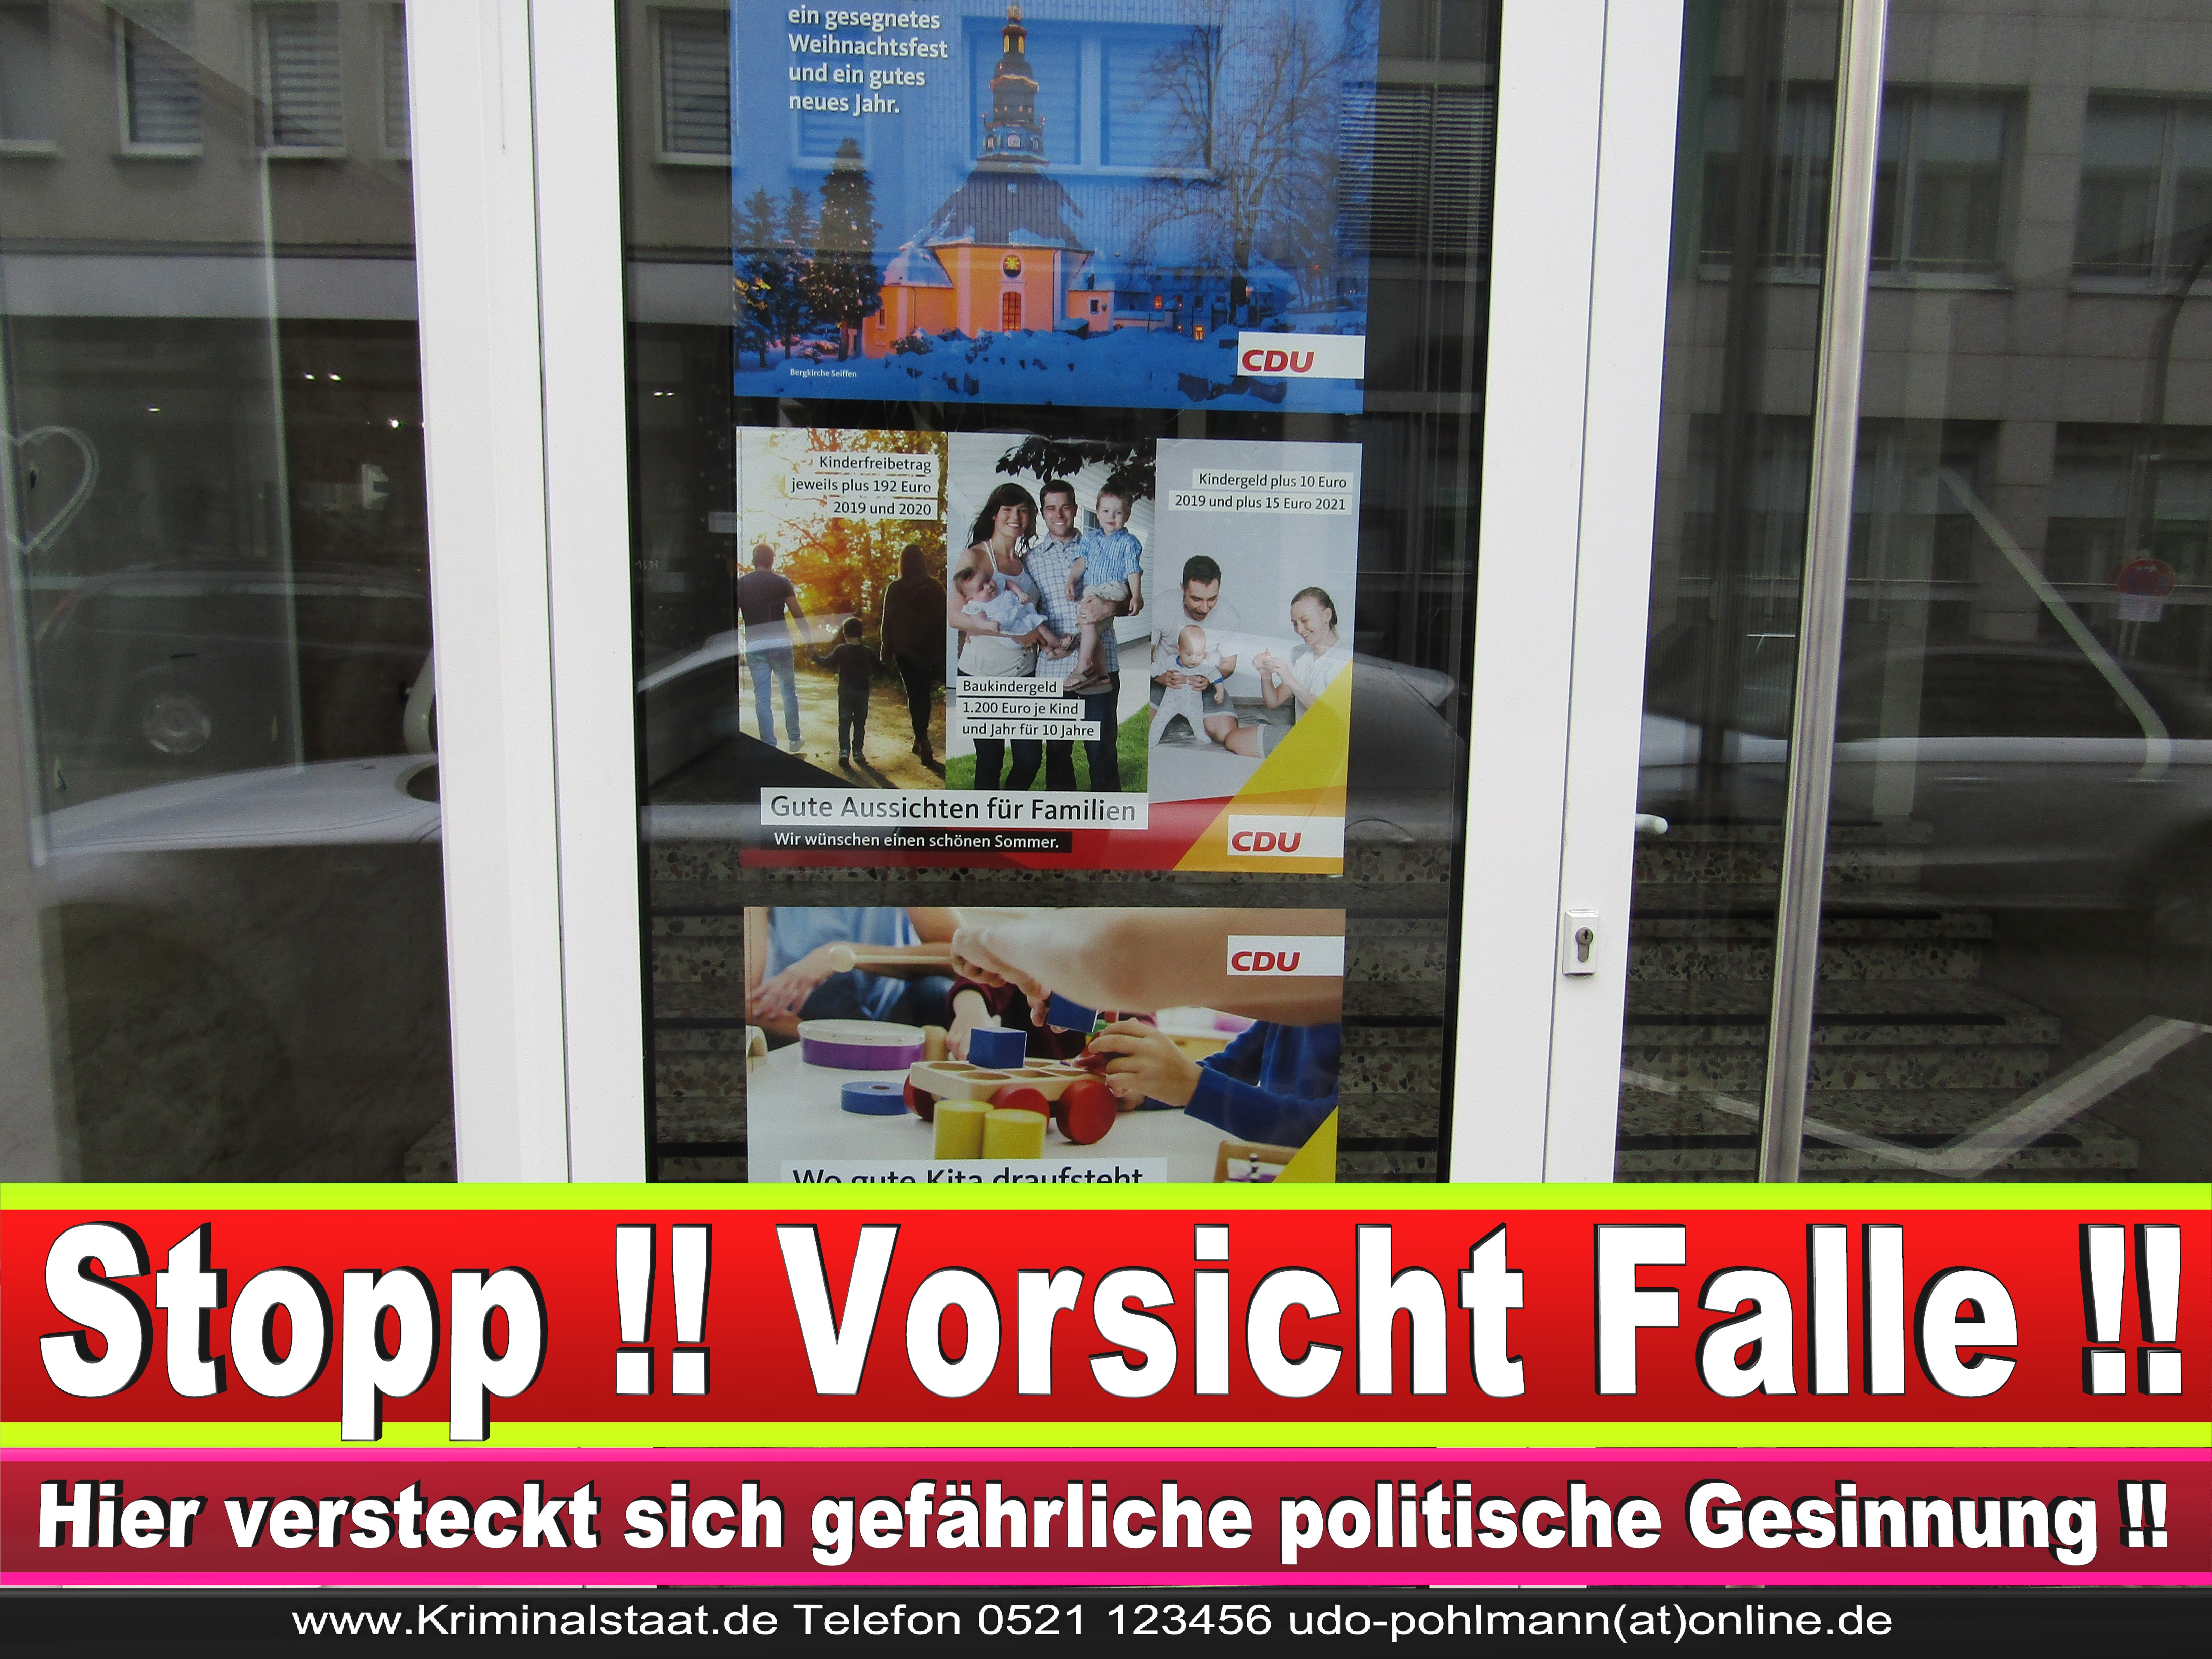 CDU DORTMUND KREISVERBAND BüRGERBüRO CDU FRAKTION ORTSVERBAND CDU NRW GESCHäFTSSTELLE ADRESSE RATSMITGLIEDER CDU (1) 1